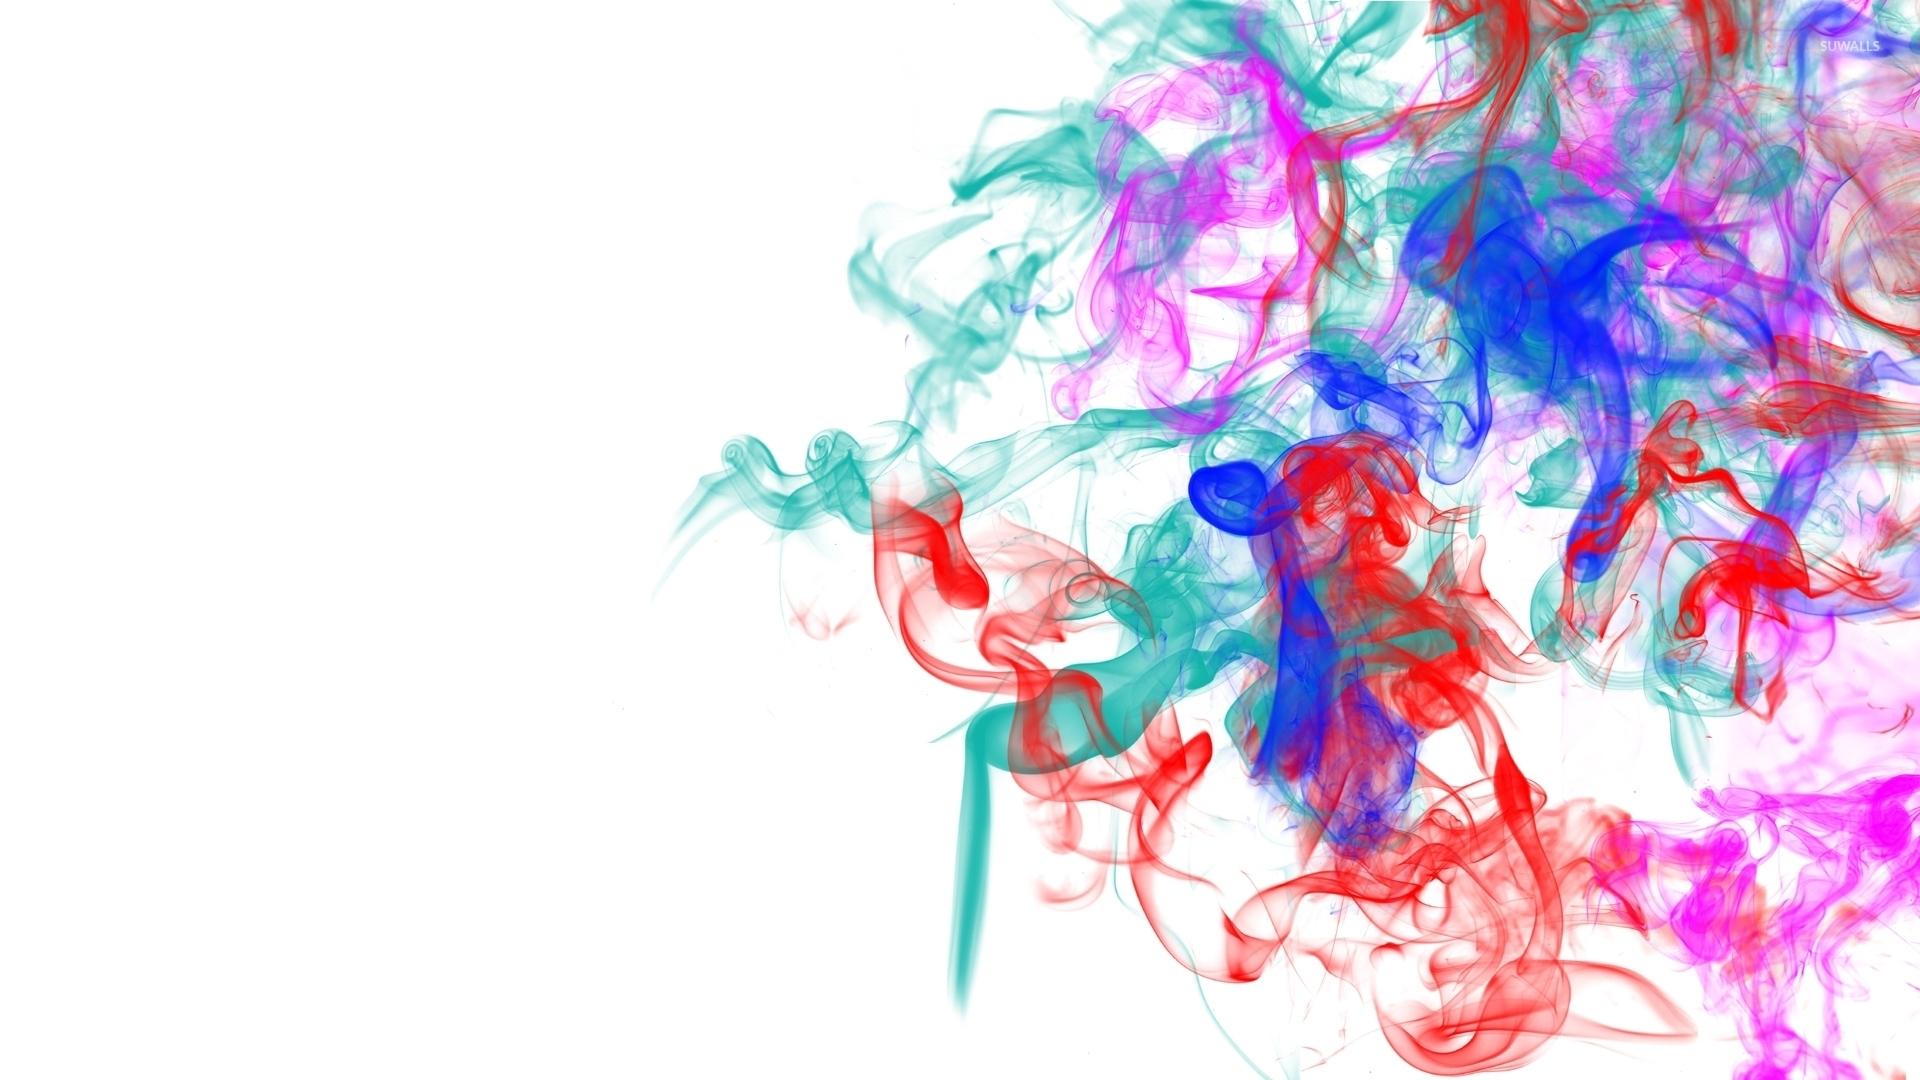 colorful smoke mixing wallpaper - digital art wallpapers - #53197